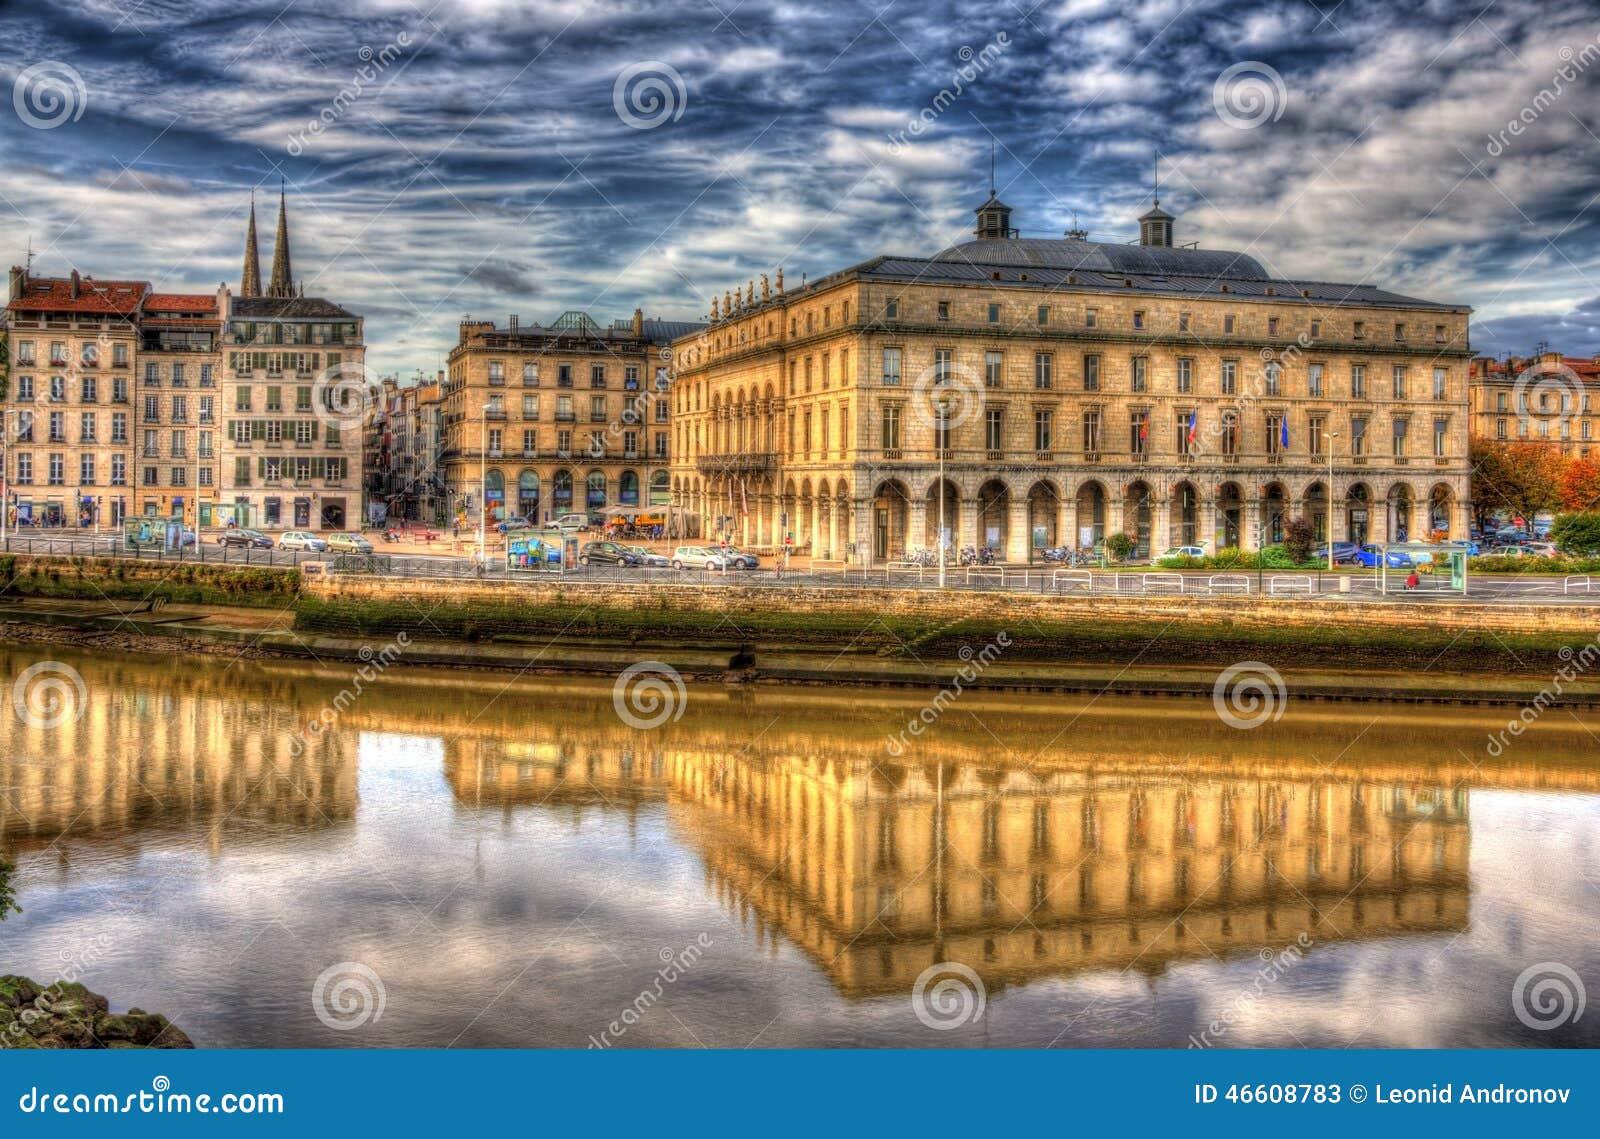 H tel de ville de bayonne france image stock image - Piscine de lauga bayonne ...